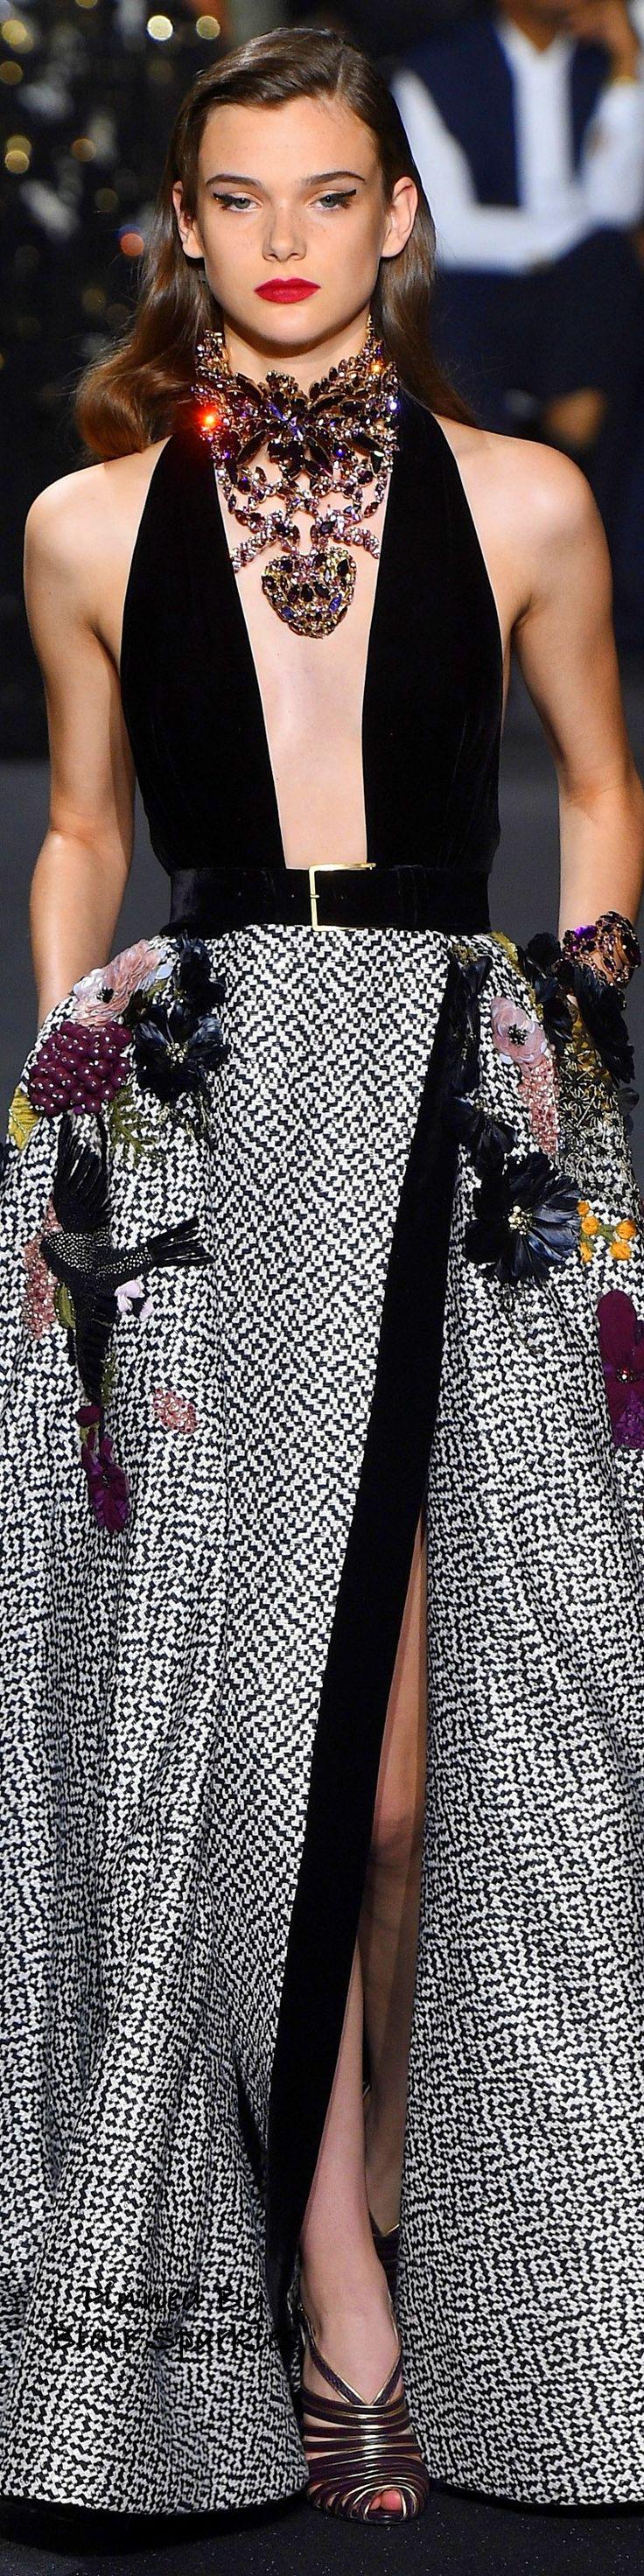 Paris Fall Couture 2016 Elie Saab ~ ♕♚εїз | BLAIR SPARKLES |